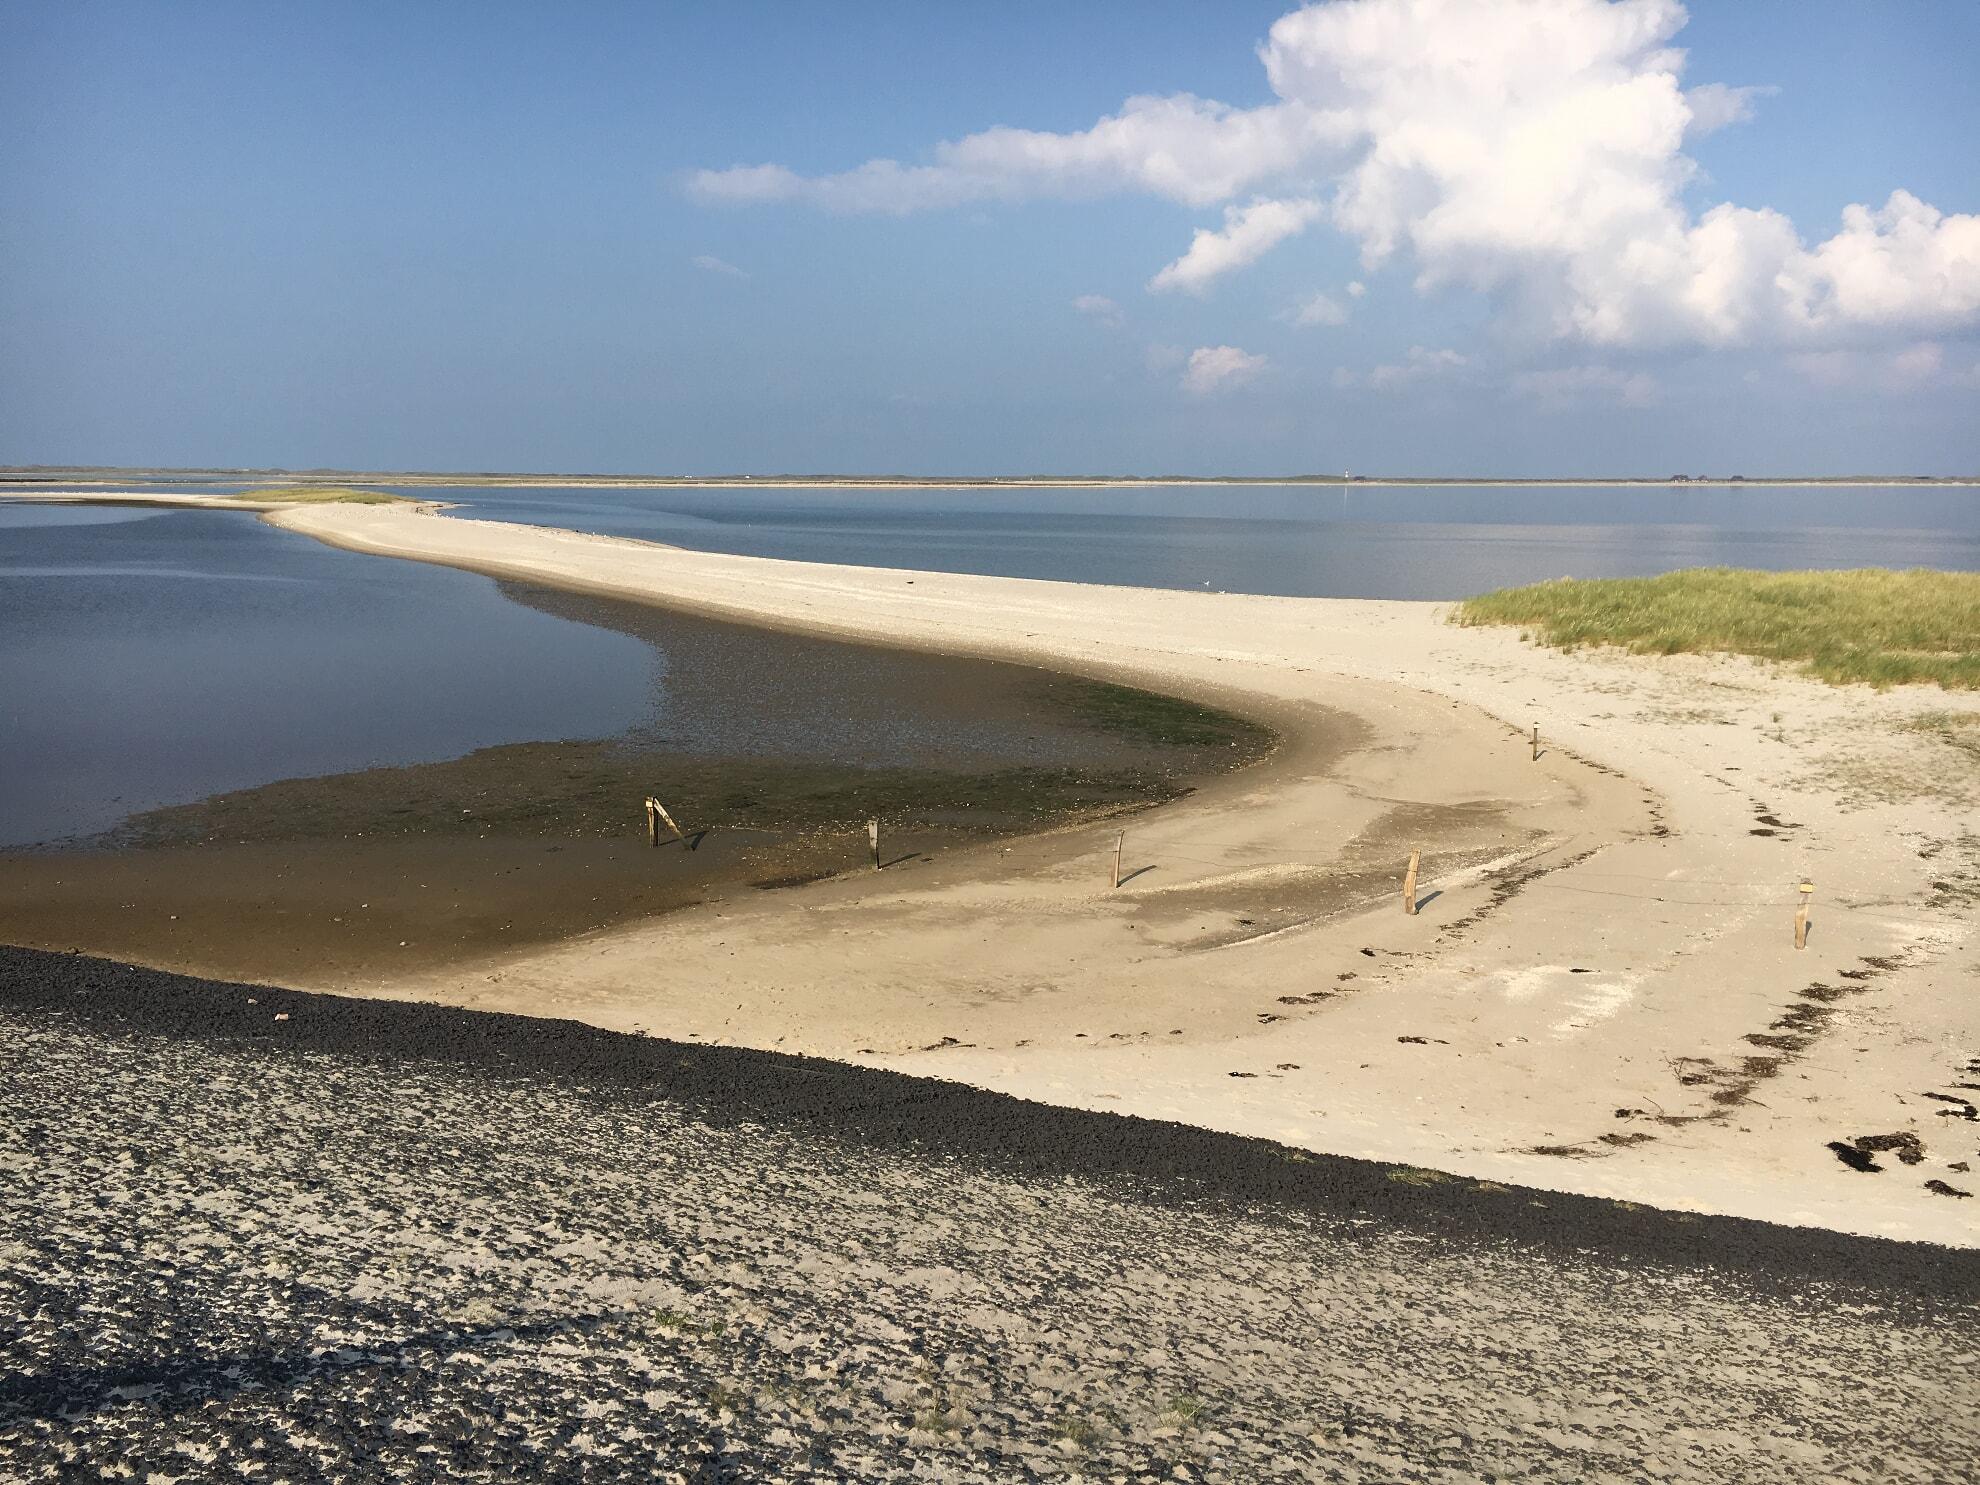 Sandbank am Lister Mövenbergdeich